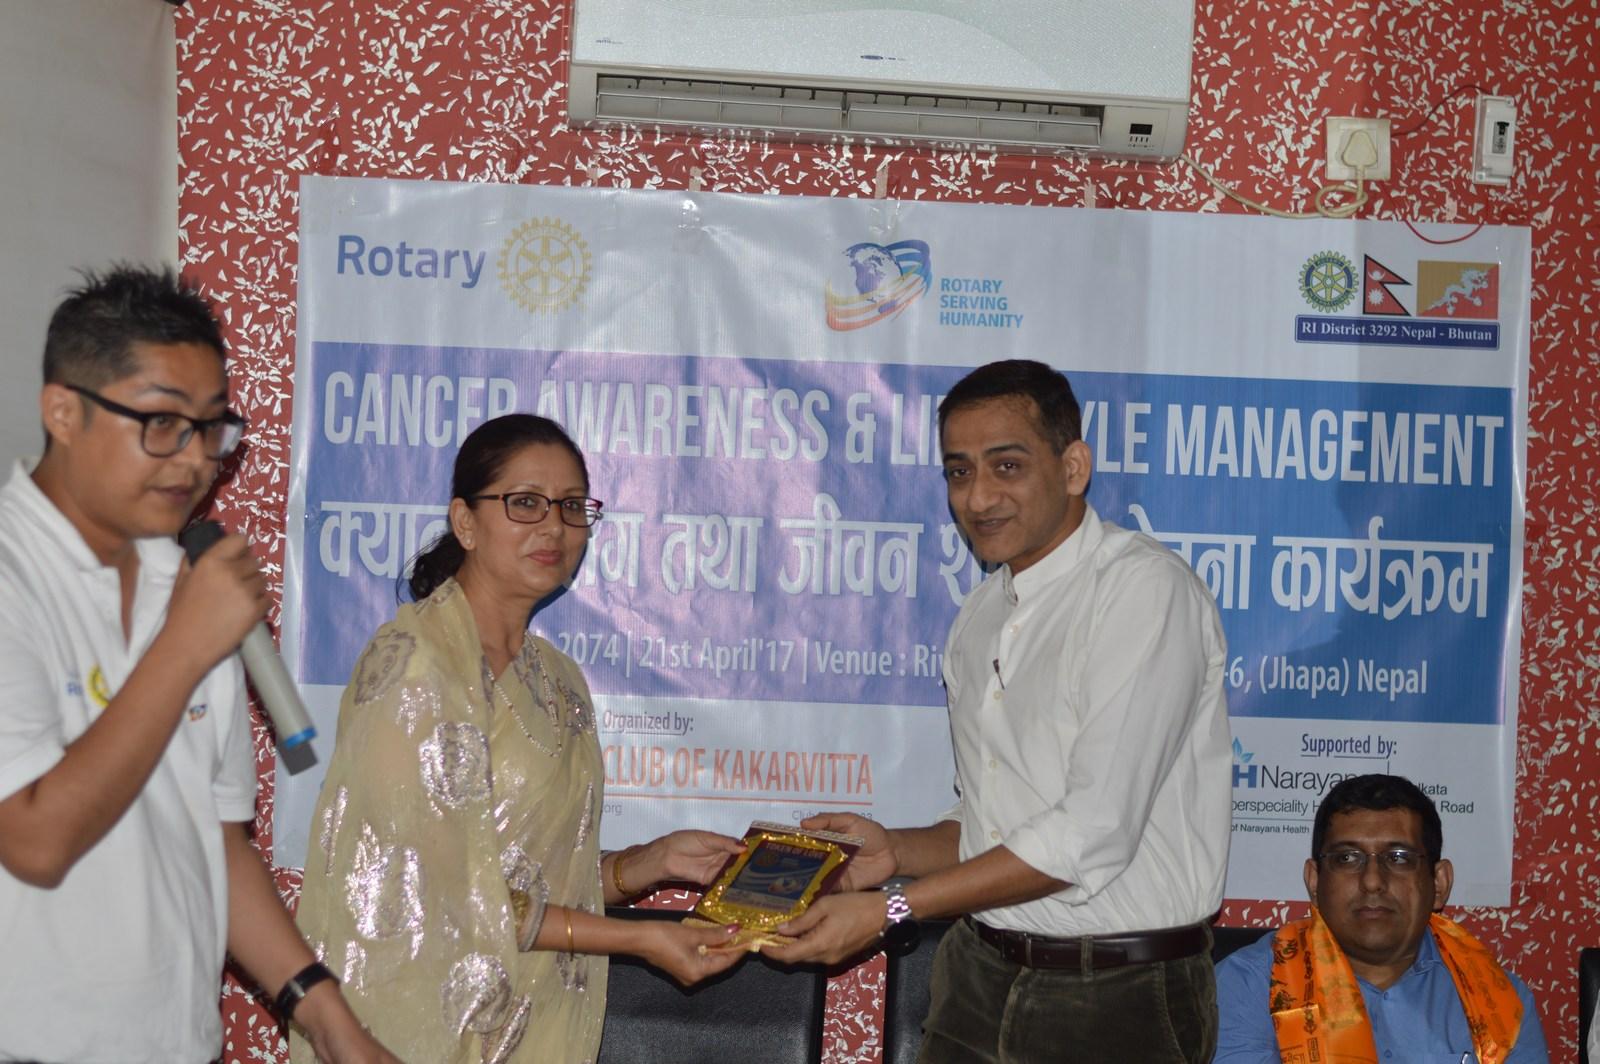 Cancer-Awareness-Life-Style-Management-Interaction-Program-2016-17-Rotary-Club-of-Kakarvitta-99